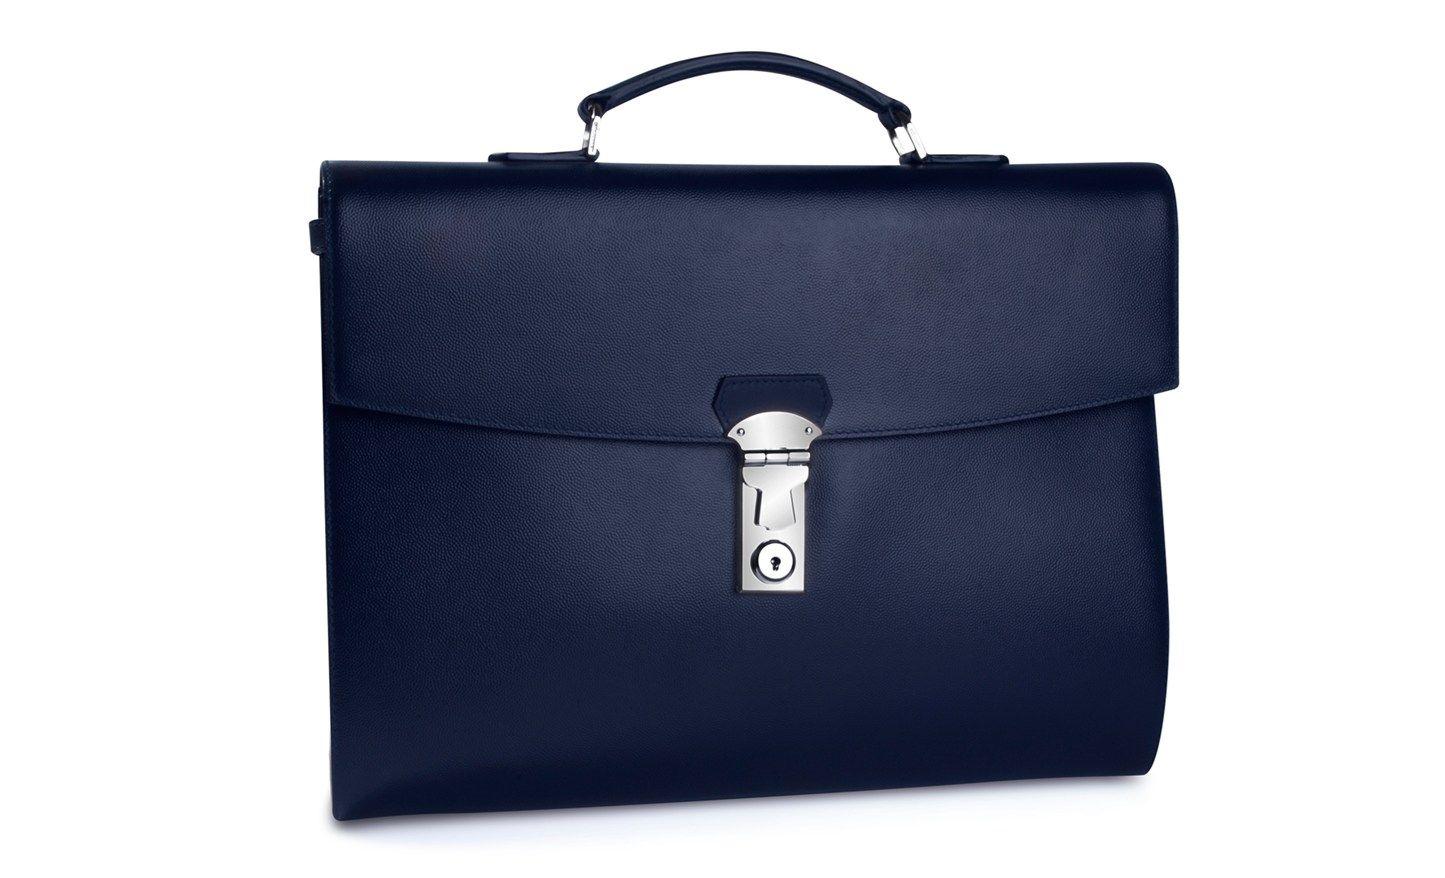 Tateossian Leather Briefcase